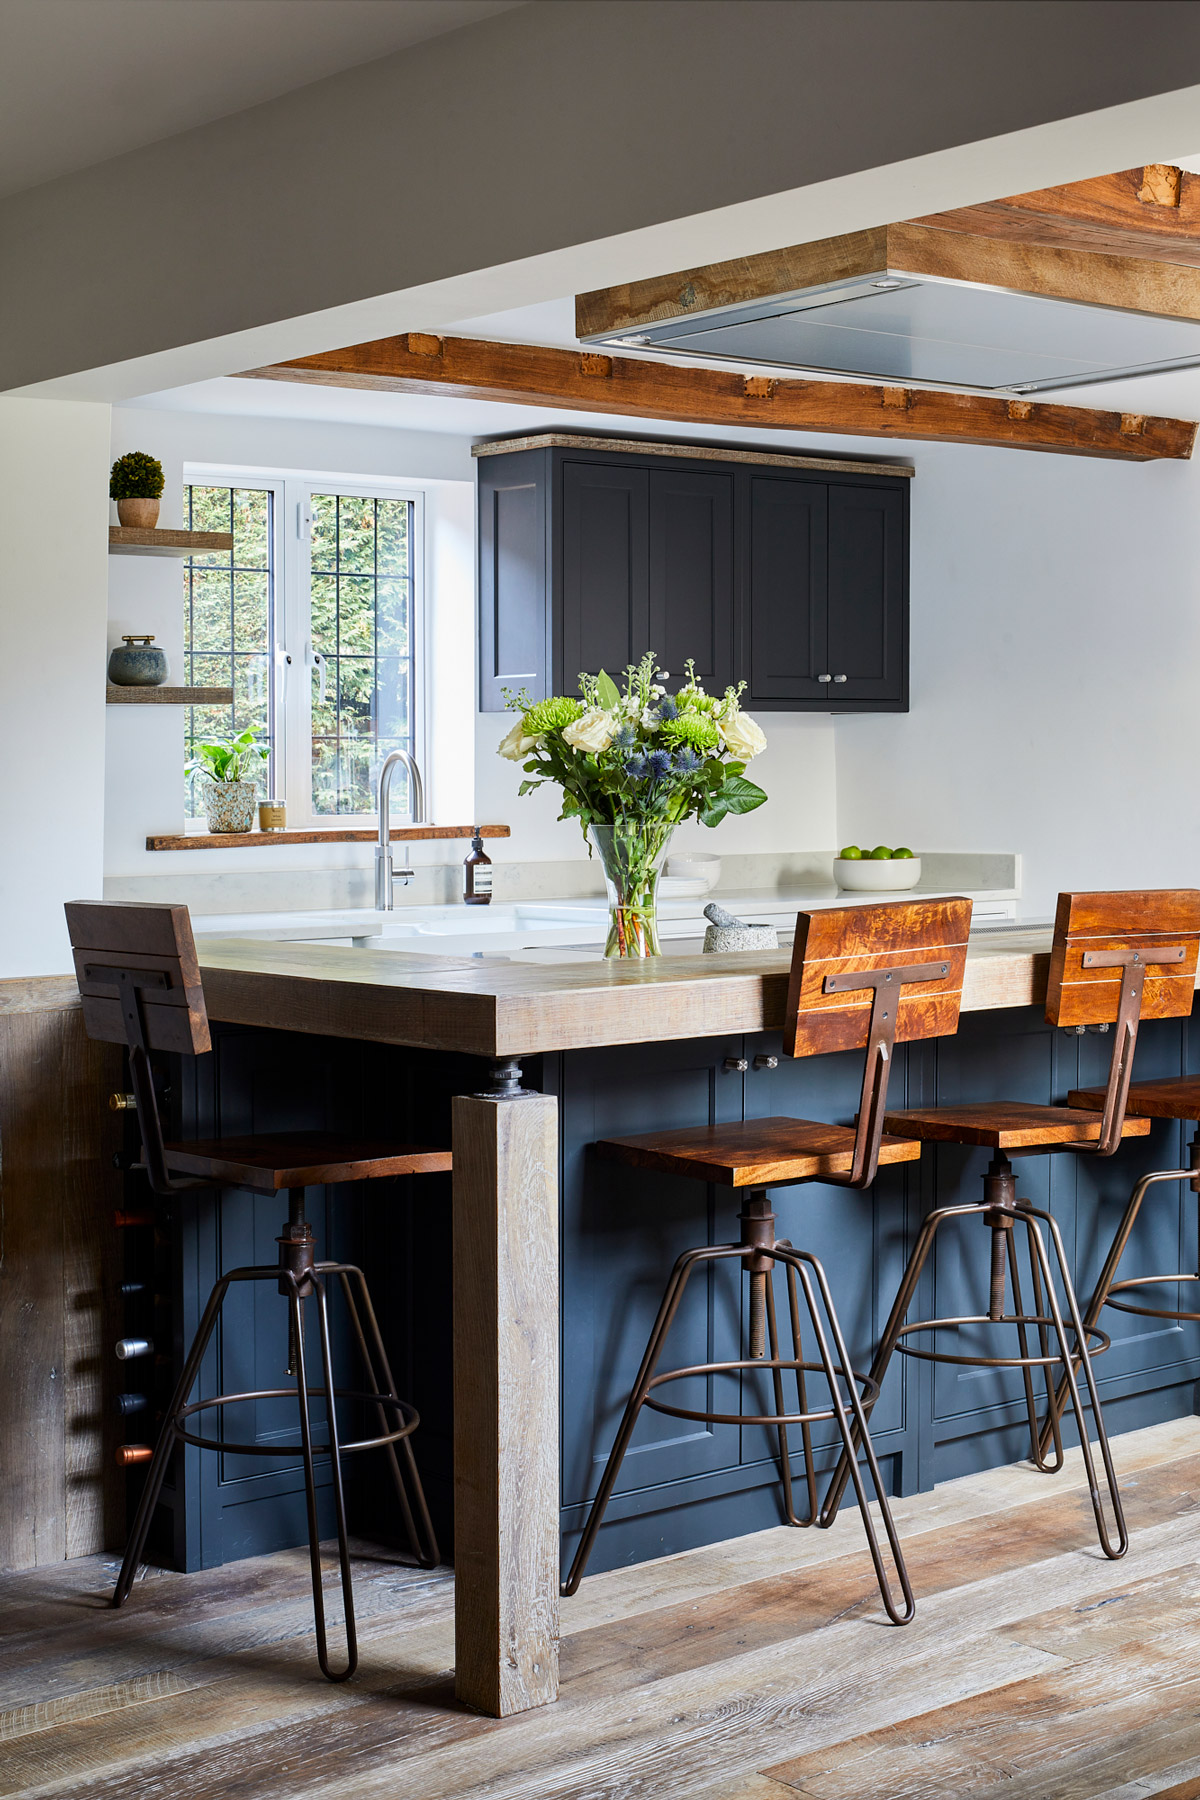 Industrial bar stools under dark kitchen island with reclaimed oak worktop